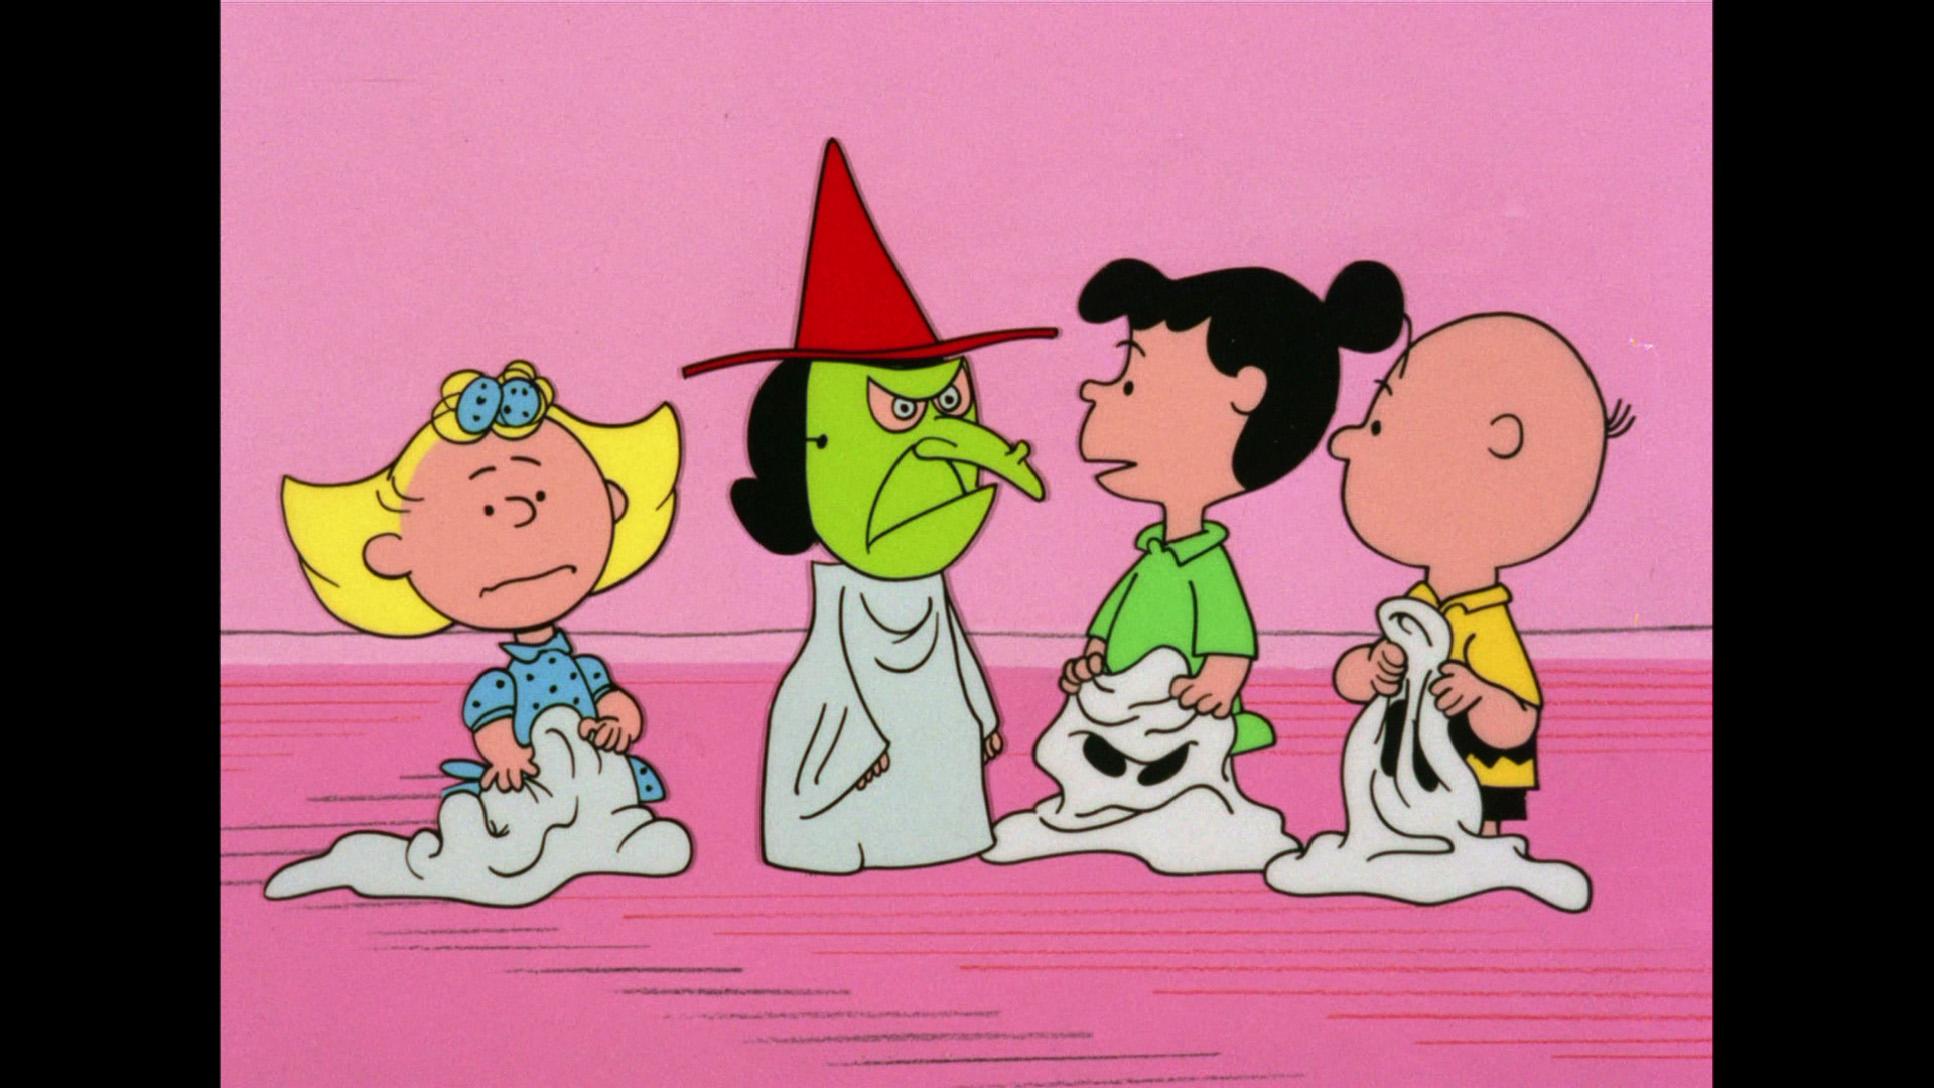 Great Pumpkin Charlie Brown Hd Wallpapers Download - Sally Brown Its Great Pumpkin Charlie Brown - HD Wallpaper